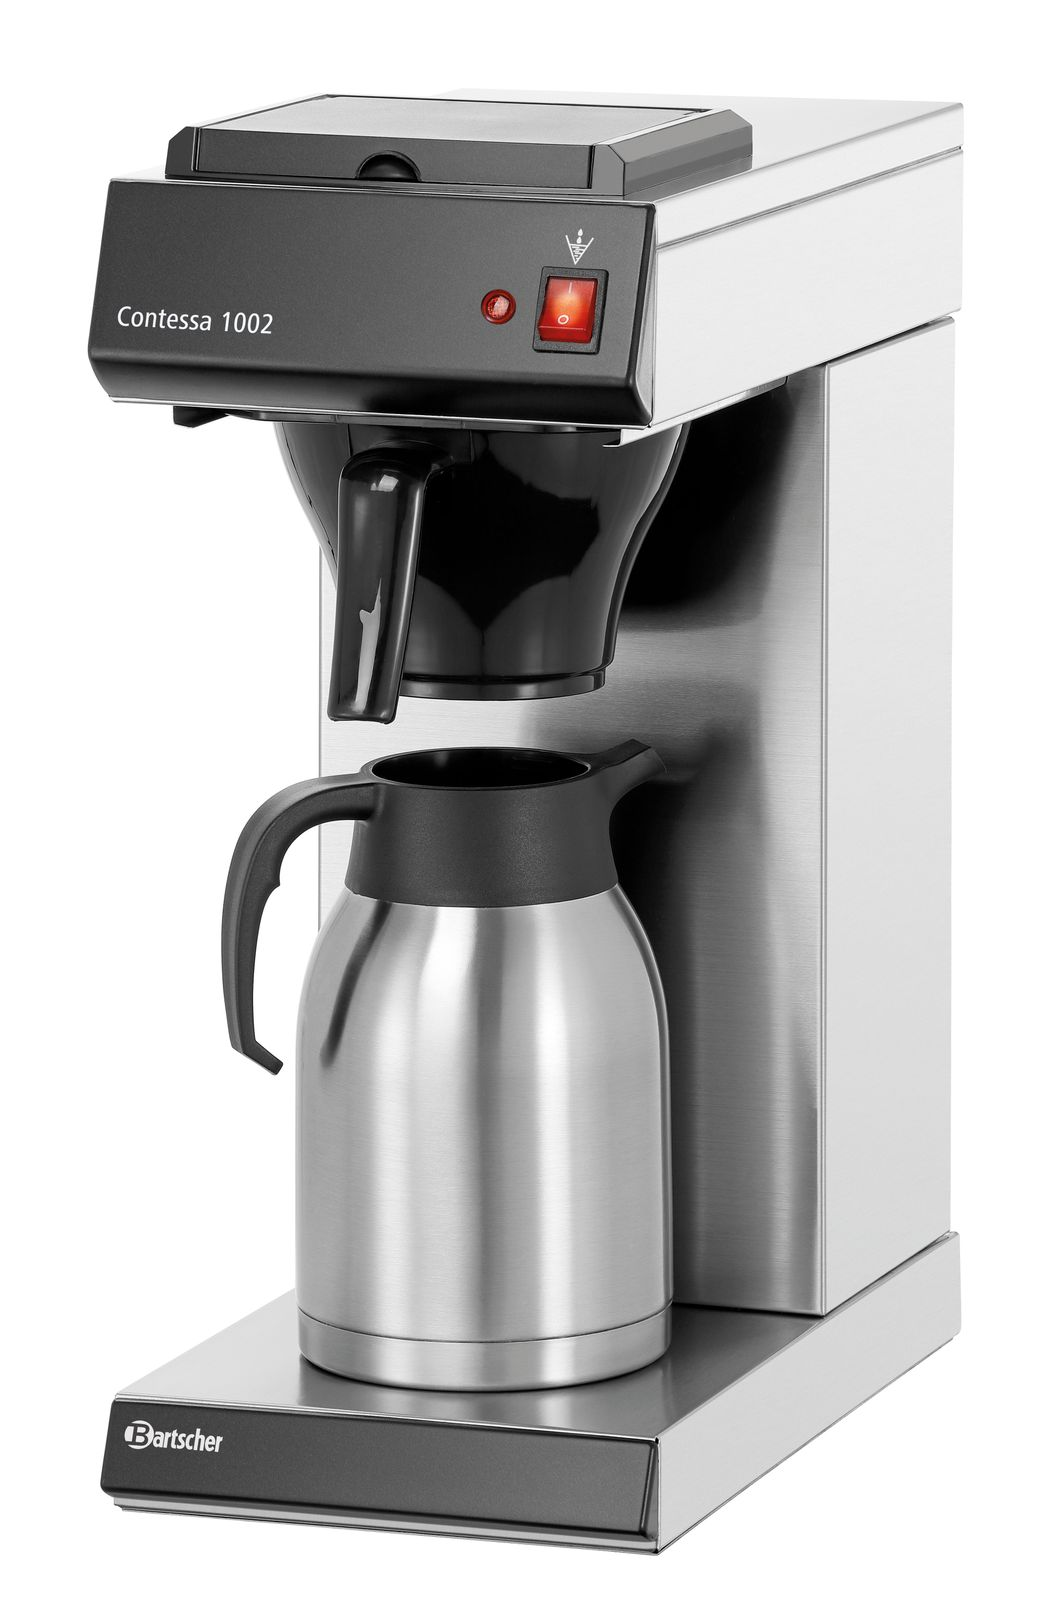 Bartscher Contessa 1002 Kaffeemaschine inkl. Isolierkanne 2l